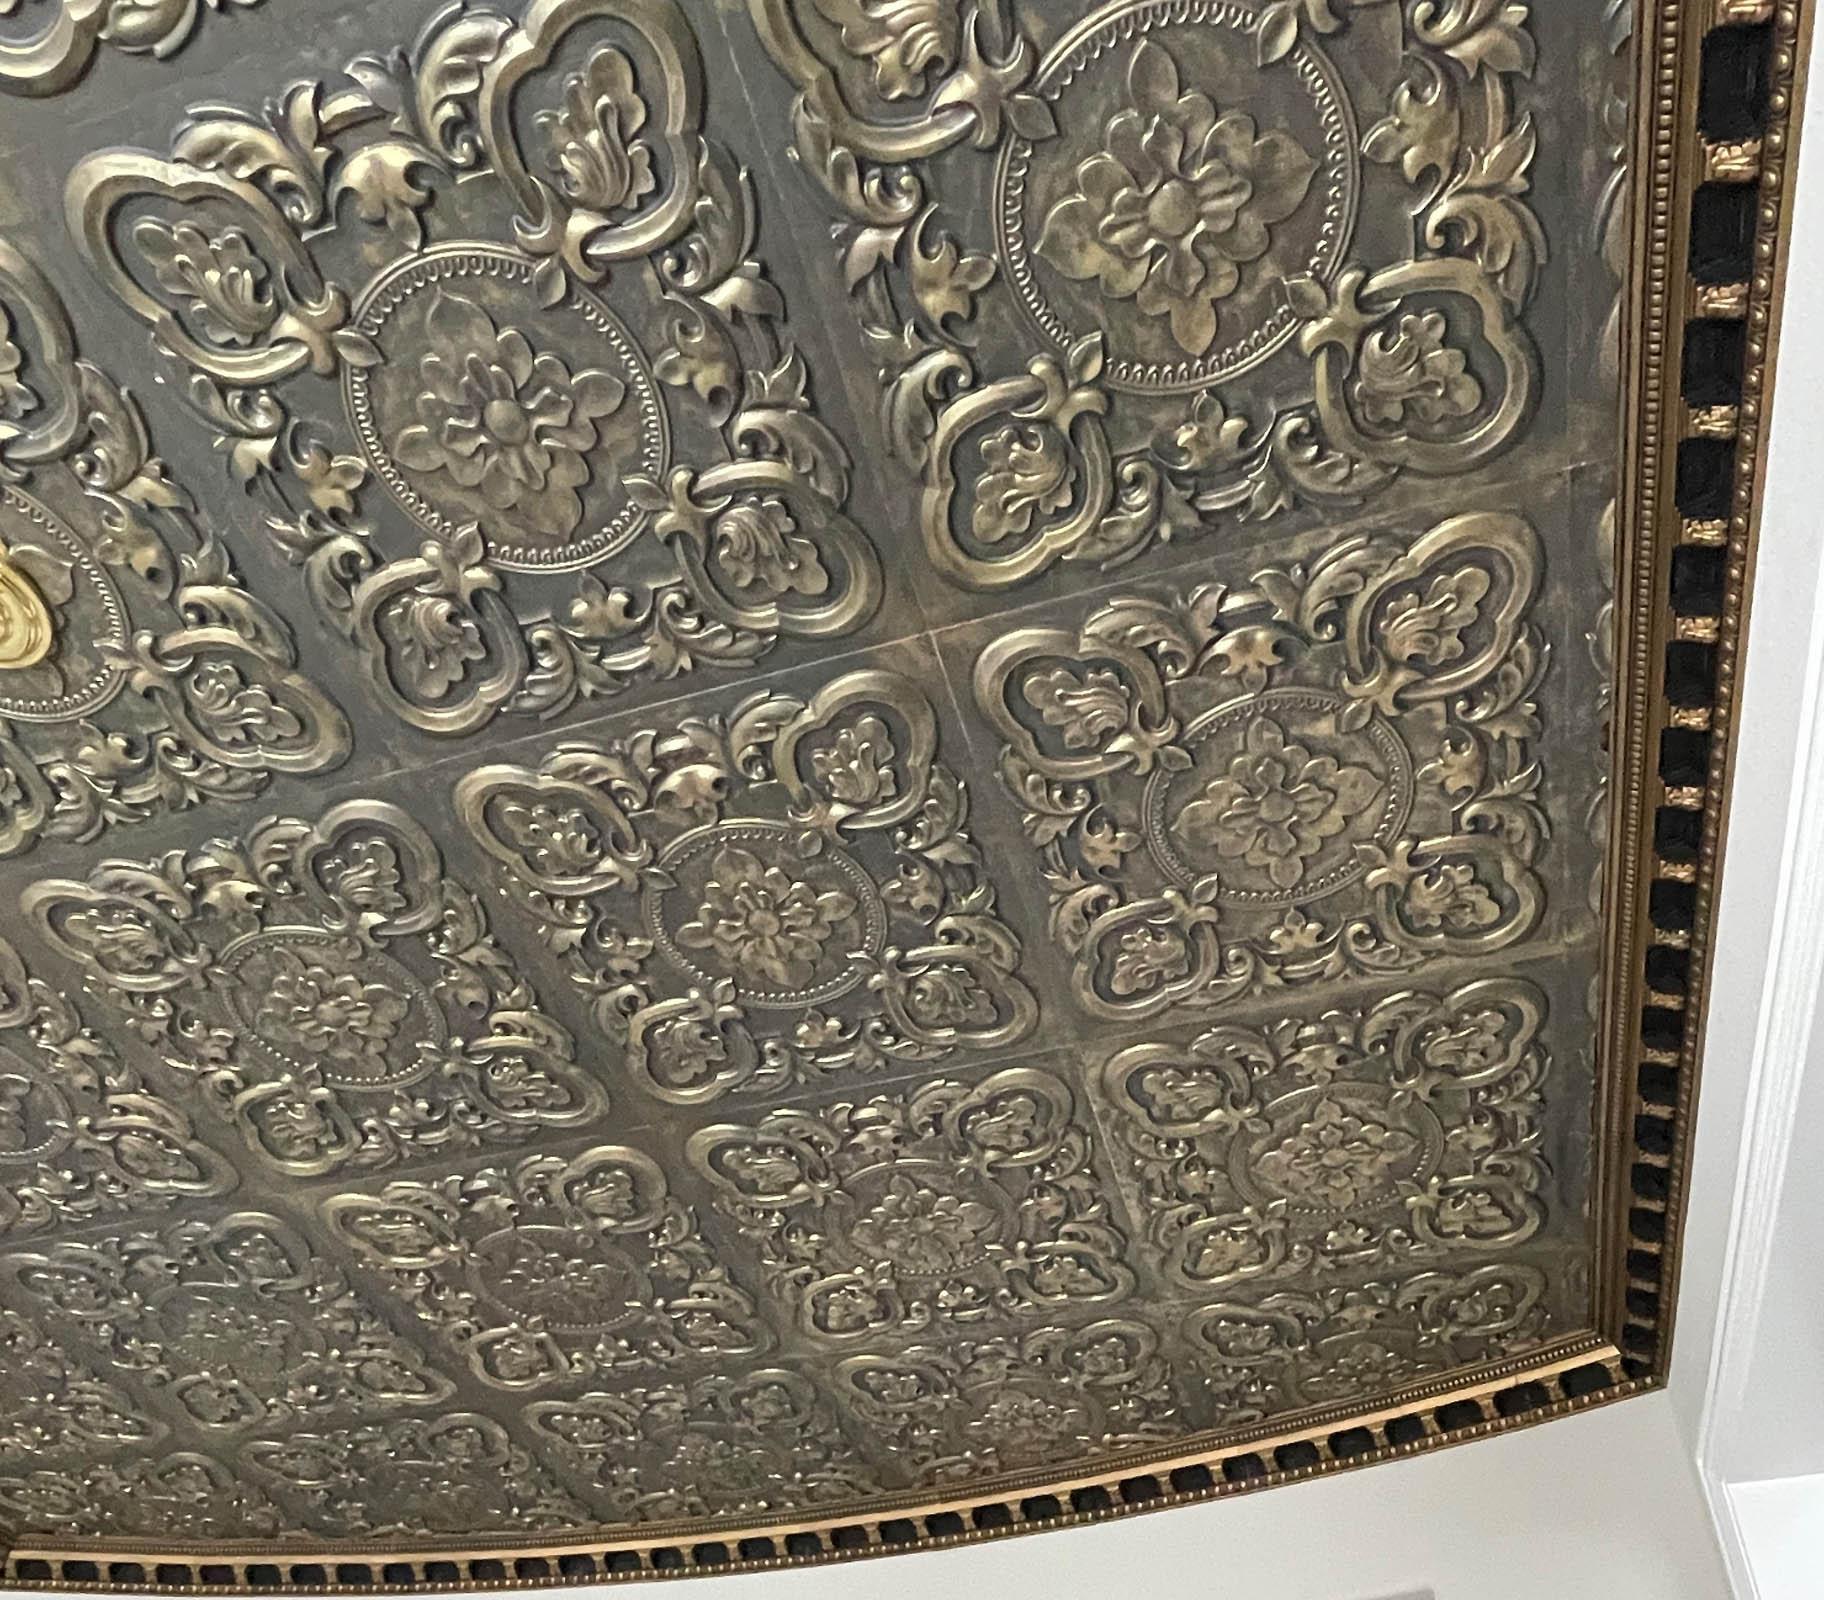 Ceiling Tile 2